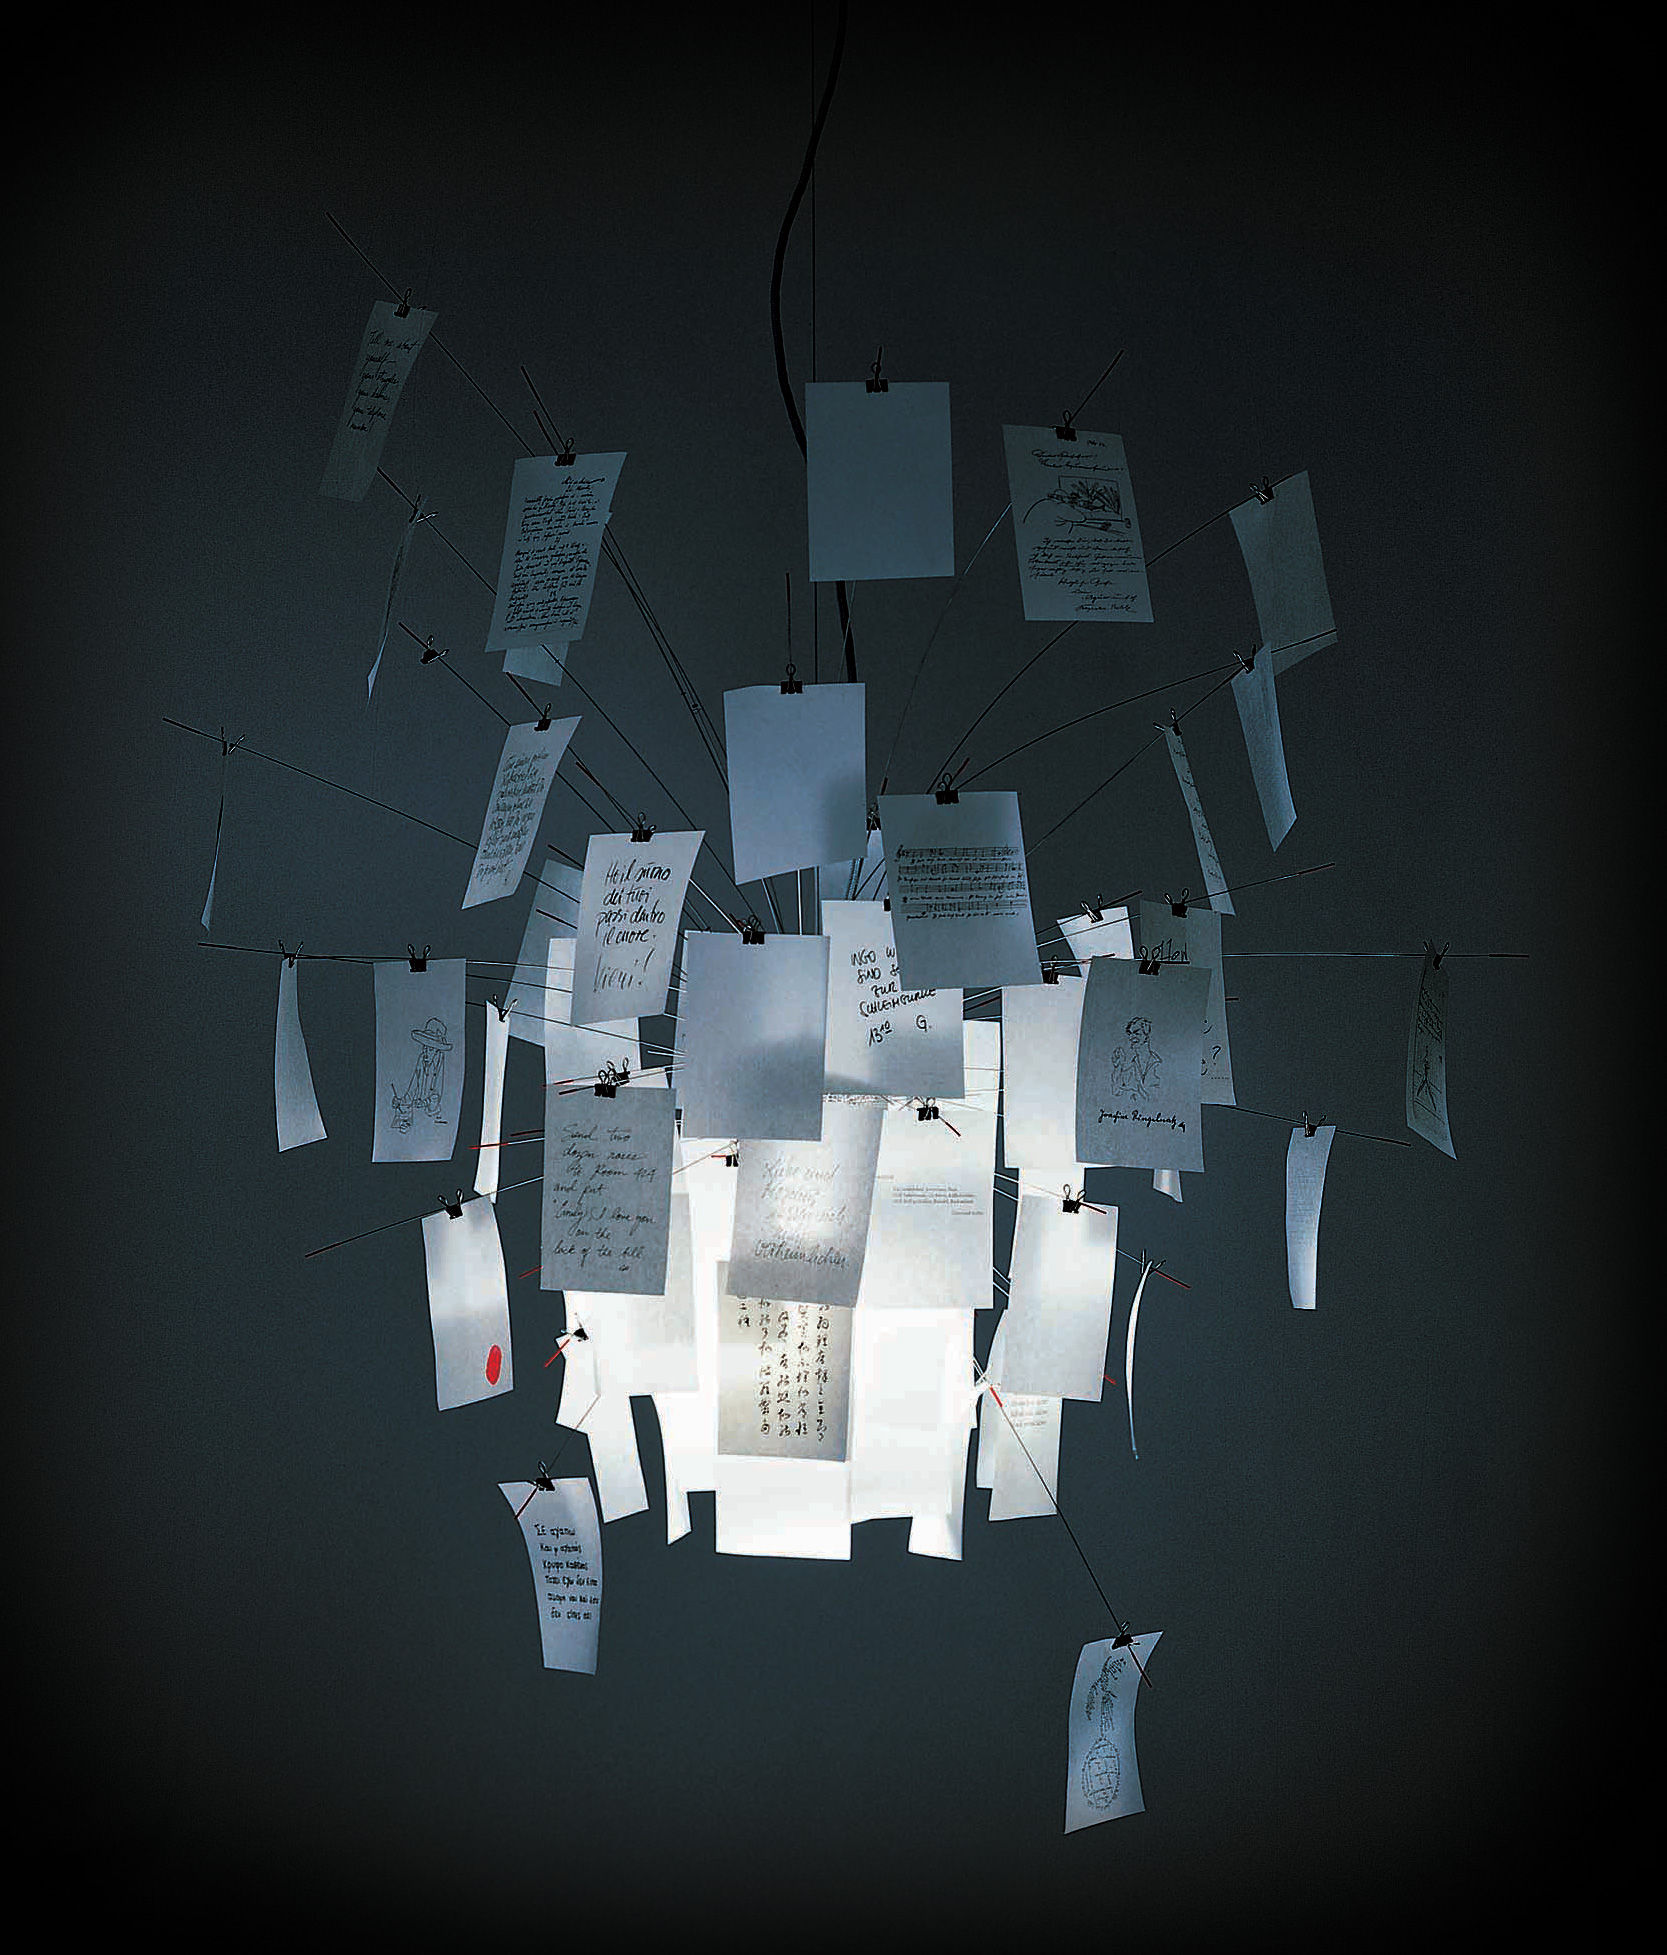 Lighting - Pendant Lighting - Zettel'z 6 Pendant by Ingo Maurer - Steel / White and printed paper - Ø 80 cm - Metal, Paper